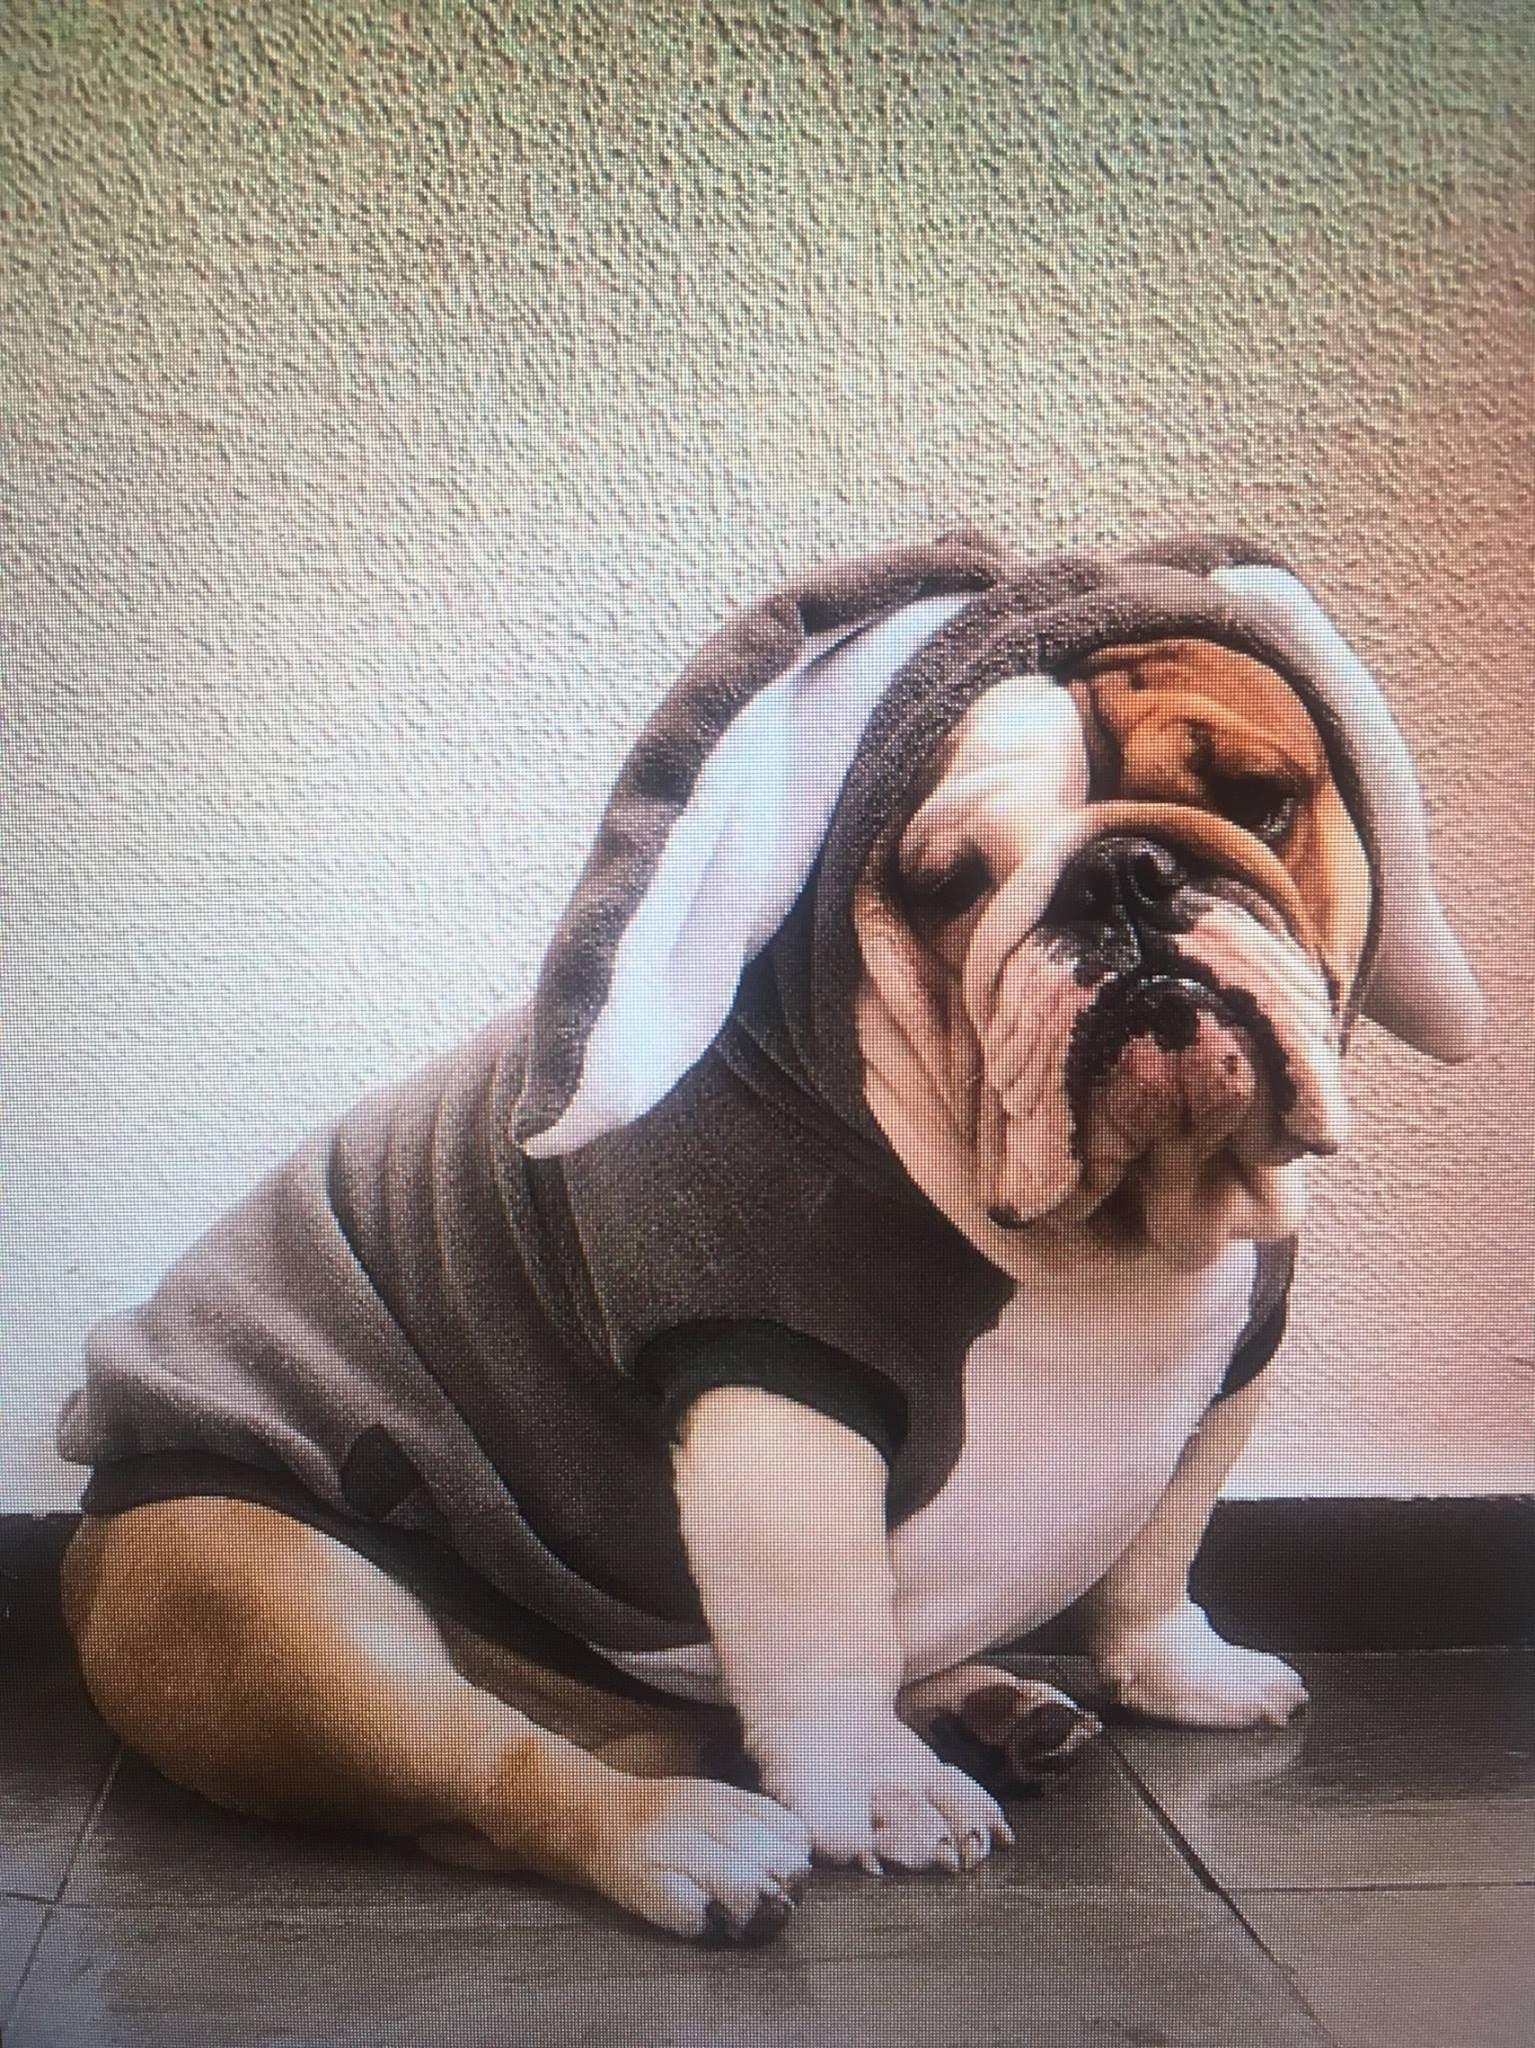 Cutest Easter Bunny Ever Adorable English Bulldog Photo Pets